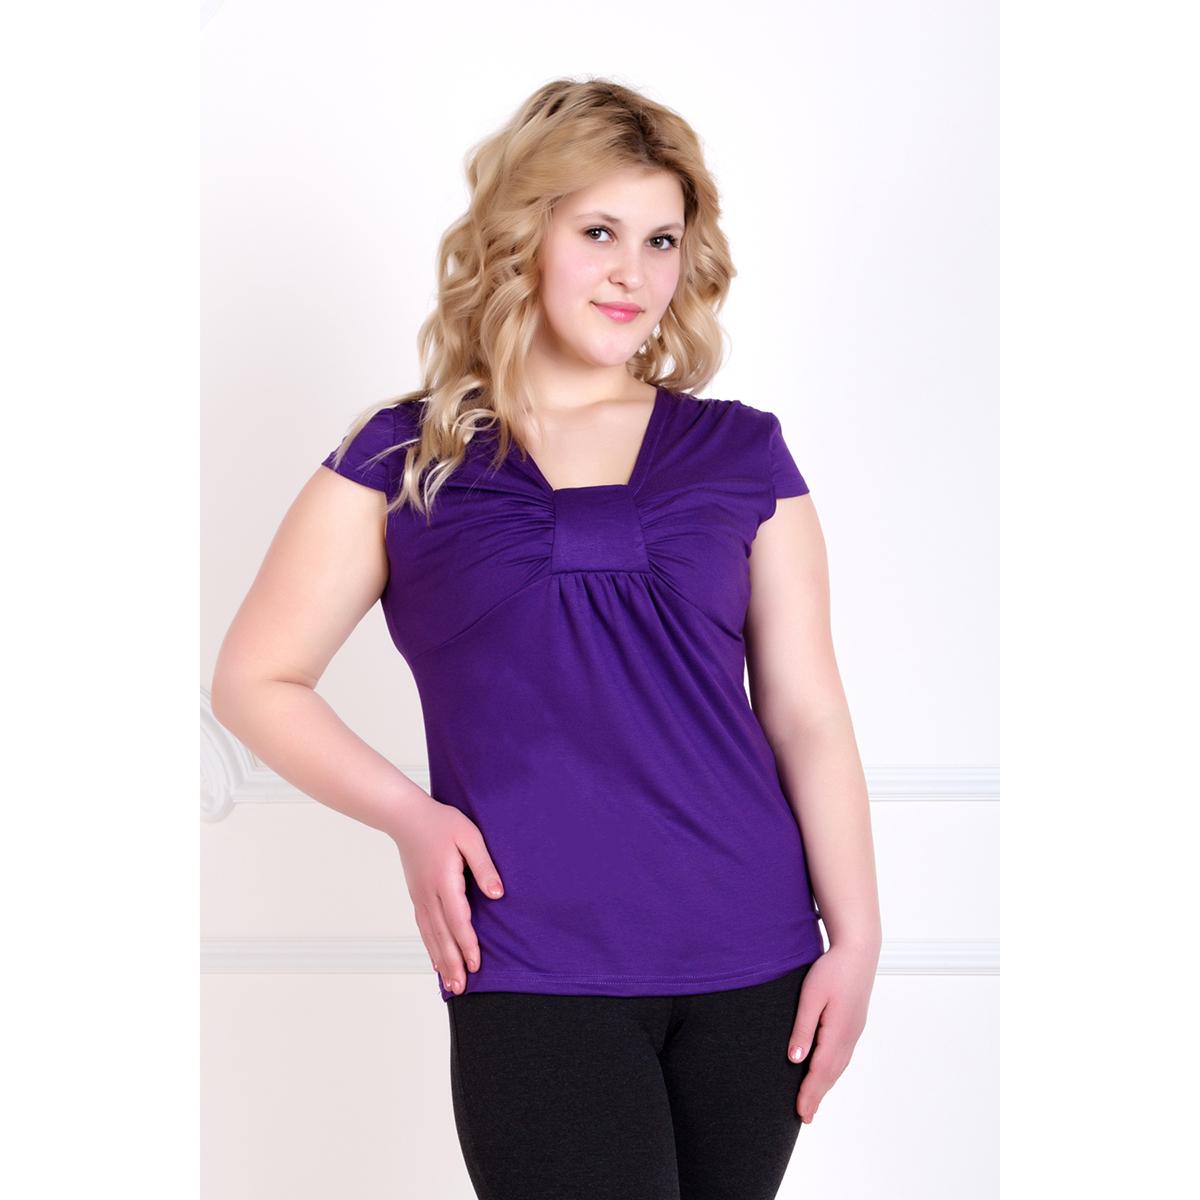 Женская блуза Романтика Фиолетовый, размер 52Блузы<br>Обхват груди:104 см<br>Обхват талии:85 см<br>Обхват бедер:112 см<br>Рост:167 см<br><br>Тип: Жен. блуза<br>Размер: 52<br>Материал: Вискоза